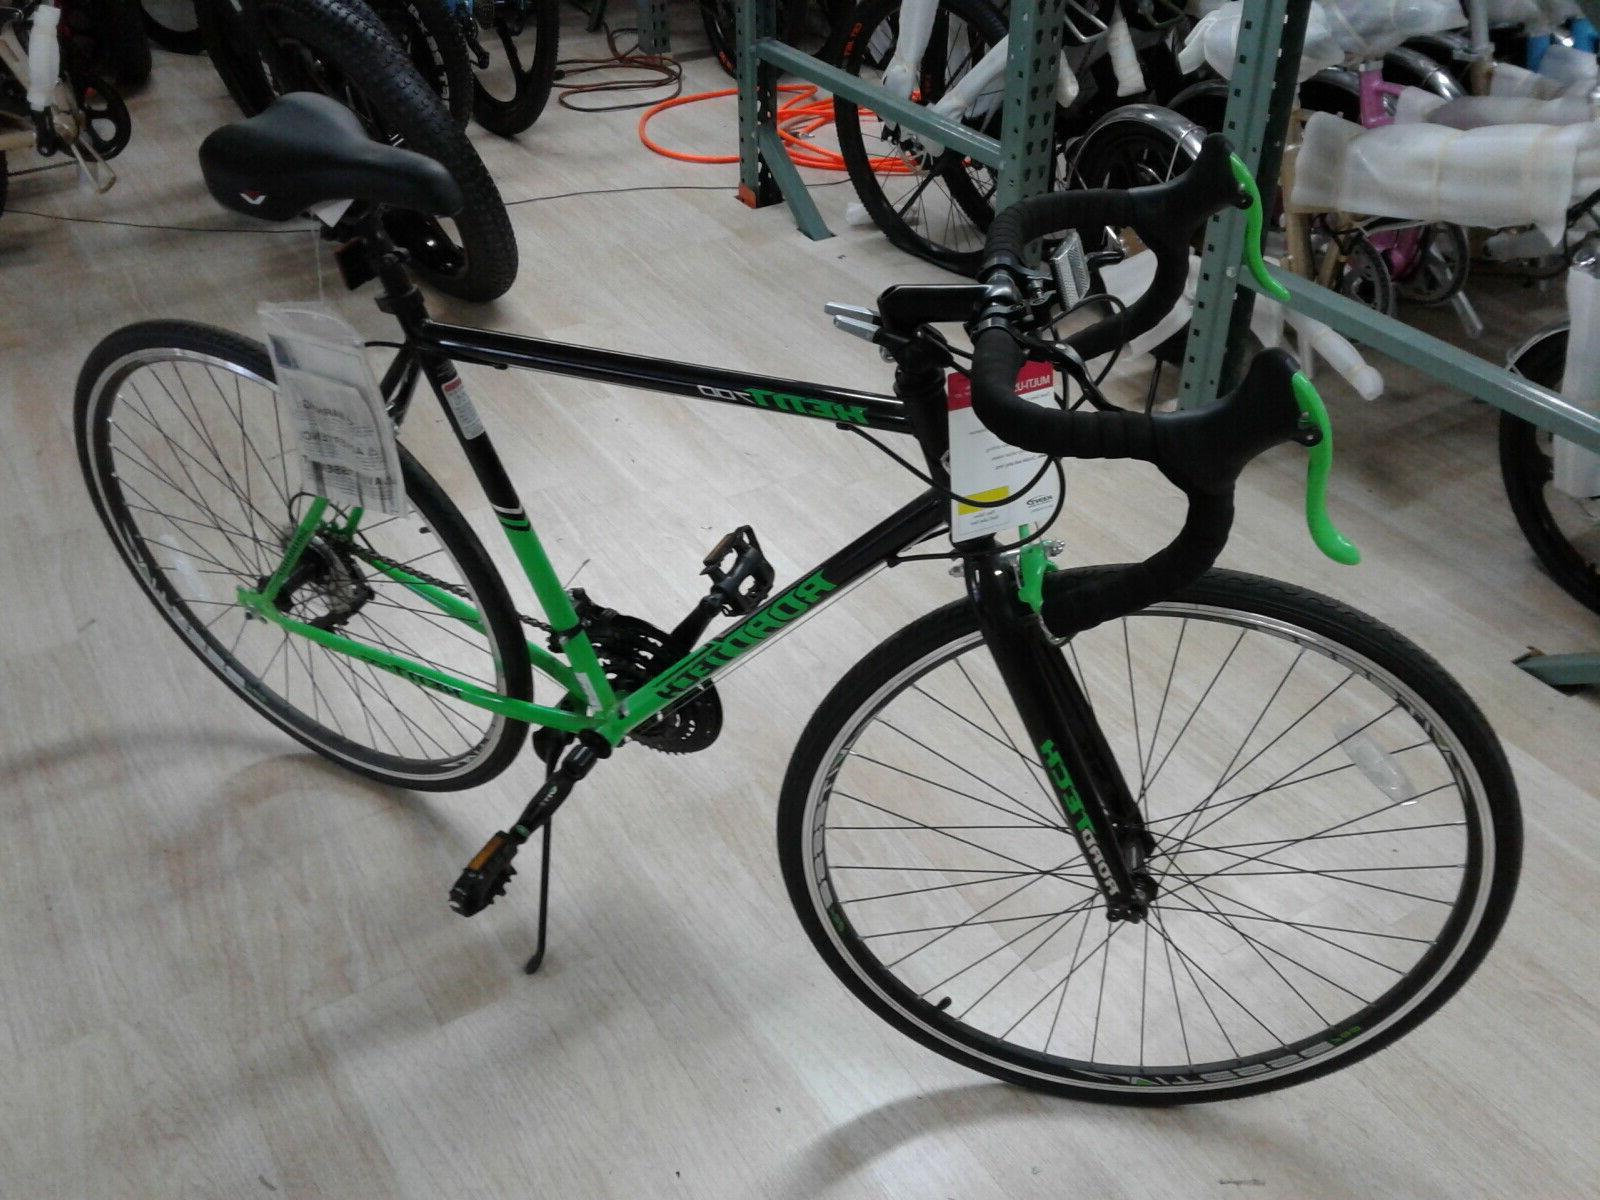 Kent 52714 700c Men's Road Bicycle - Green/Black